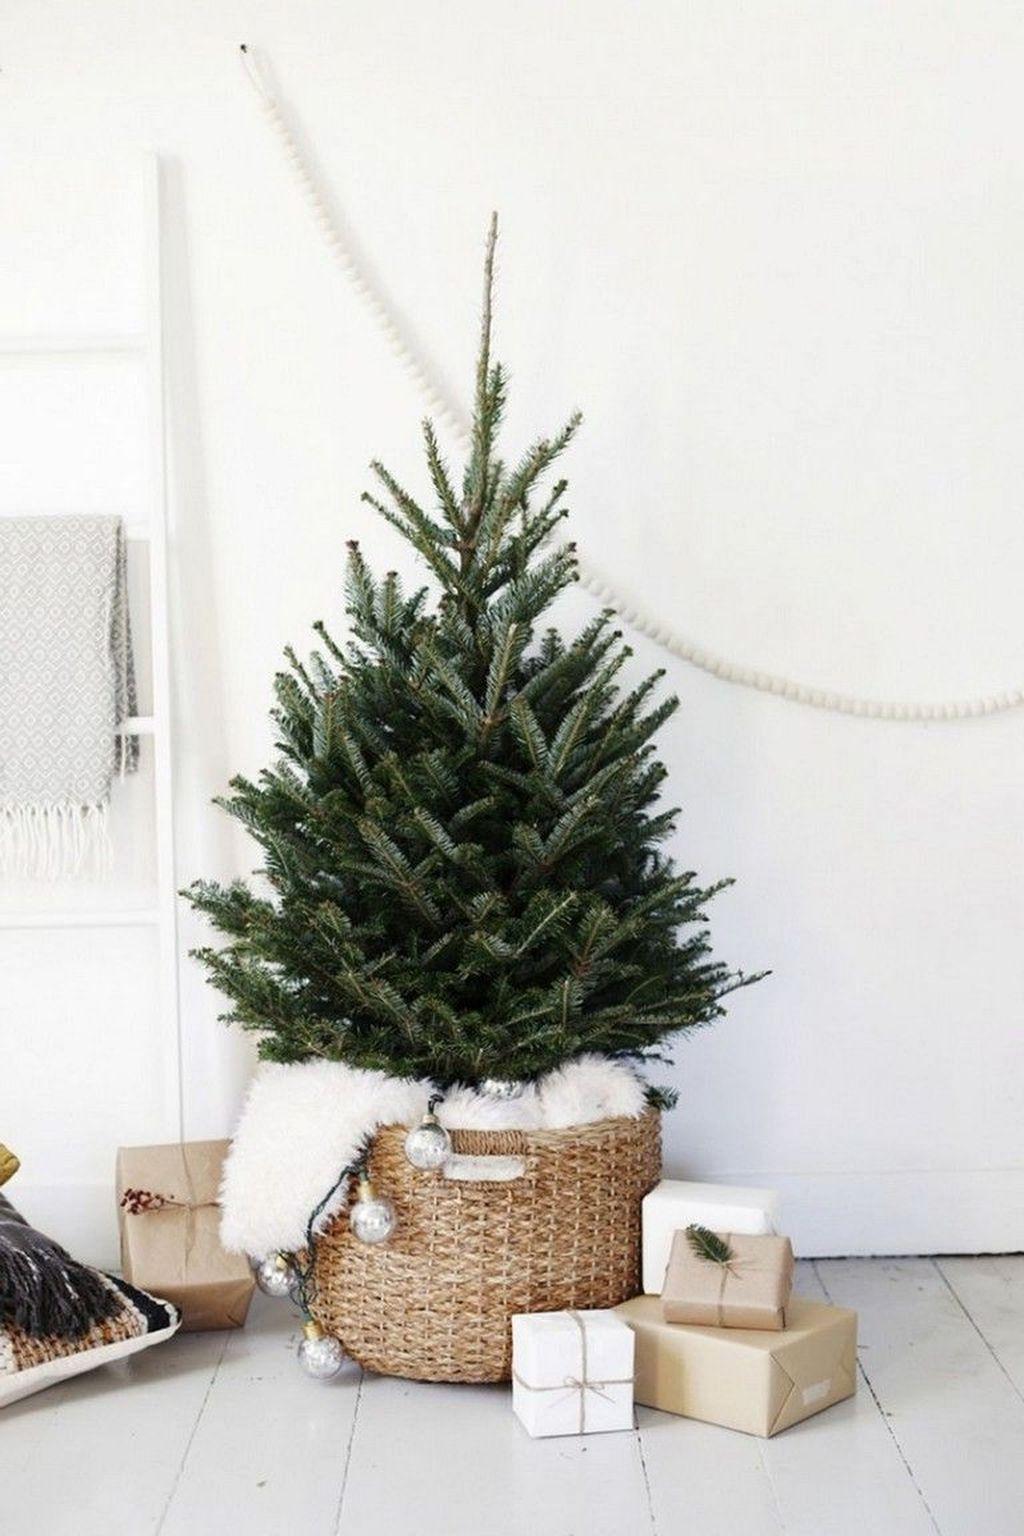 55 Small Apartment Christmas Decor Ideas #smallapartmentchristmasdecor